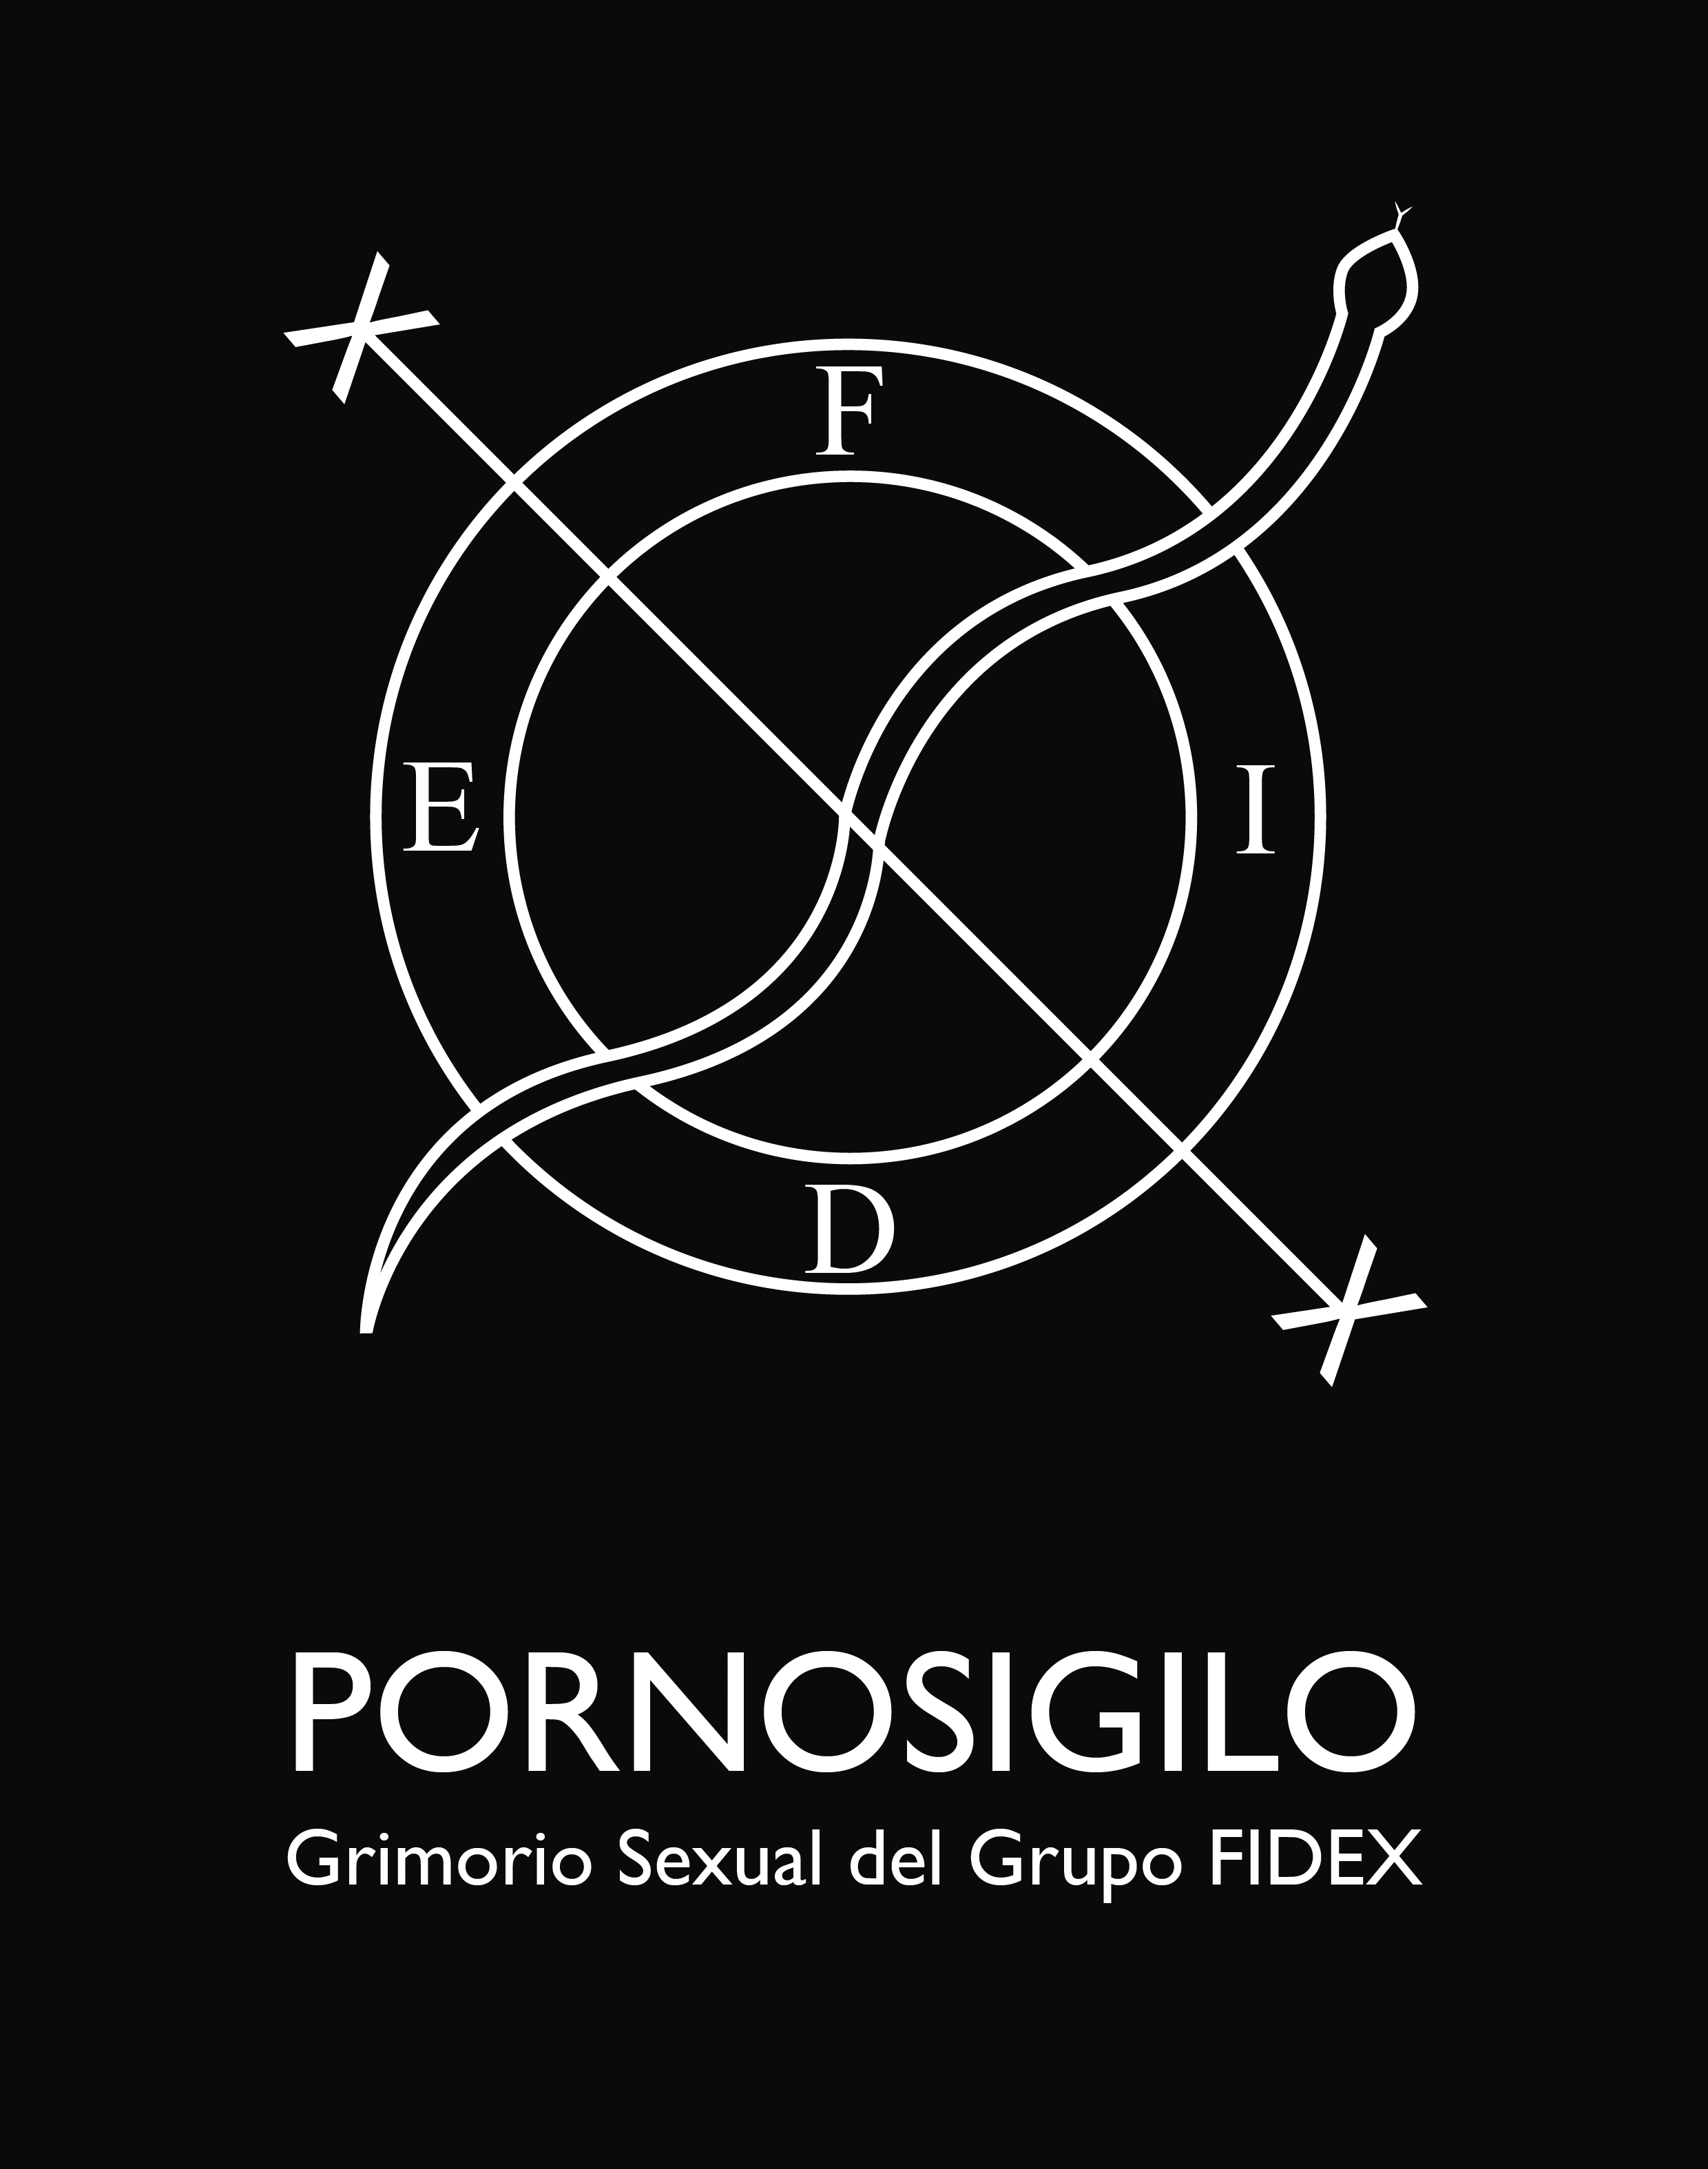 pornosigilo - FIDEX